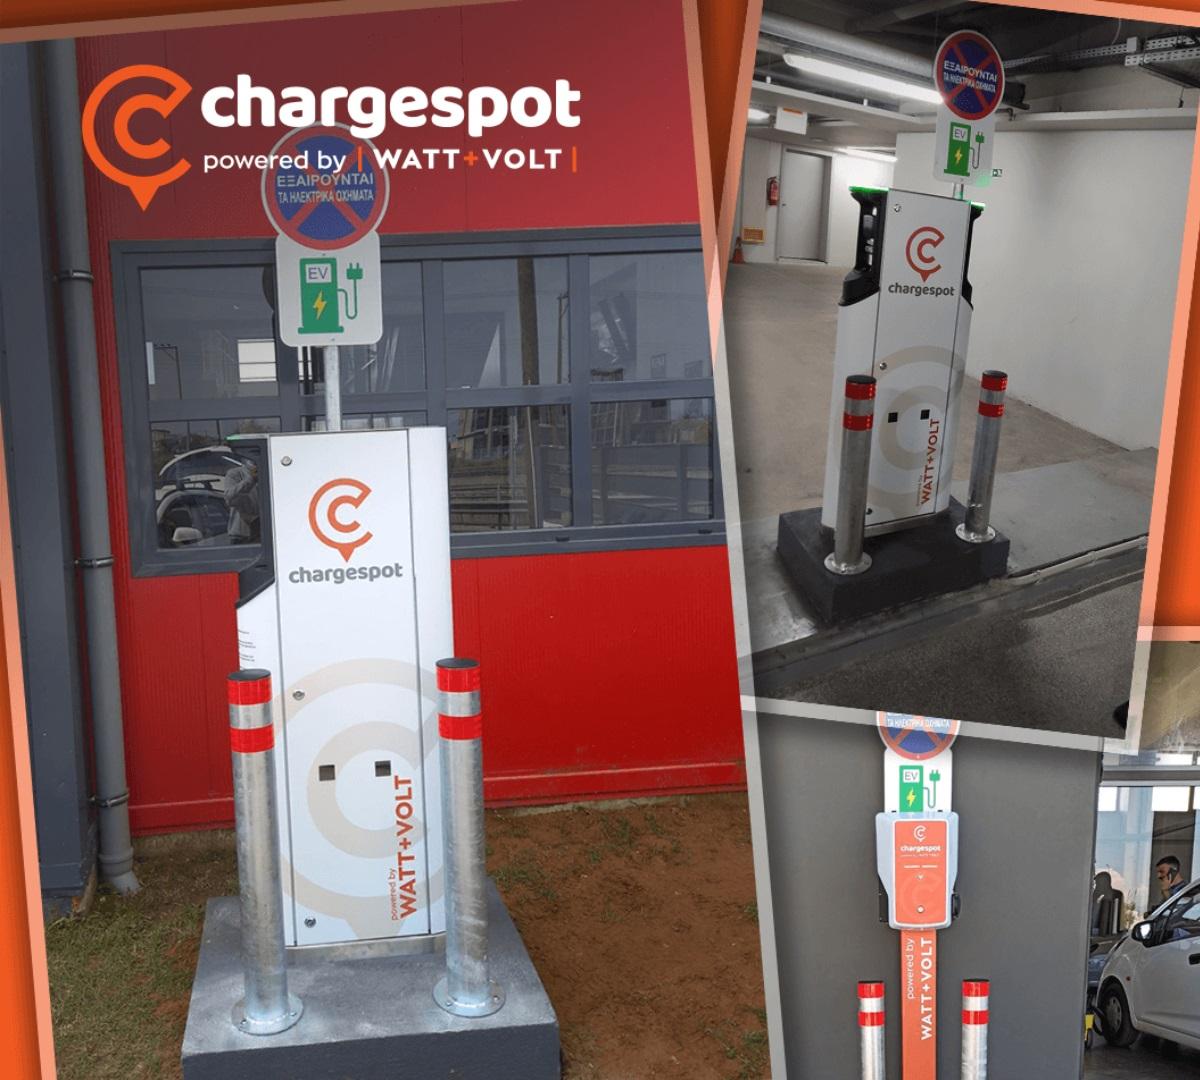 Watt+Volt: Διευρύνει το δίκτυο Chargespot και στηρίζει την ηλεκτροκίνηση